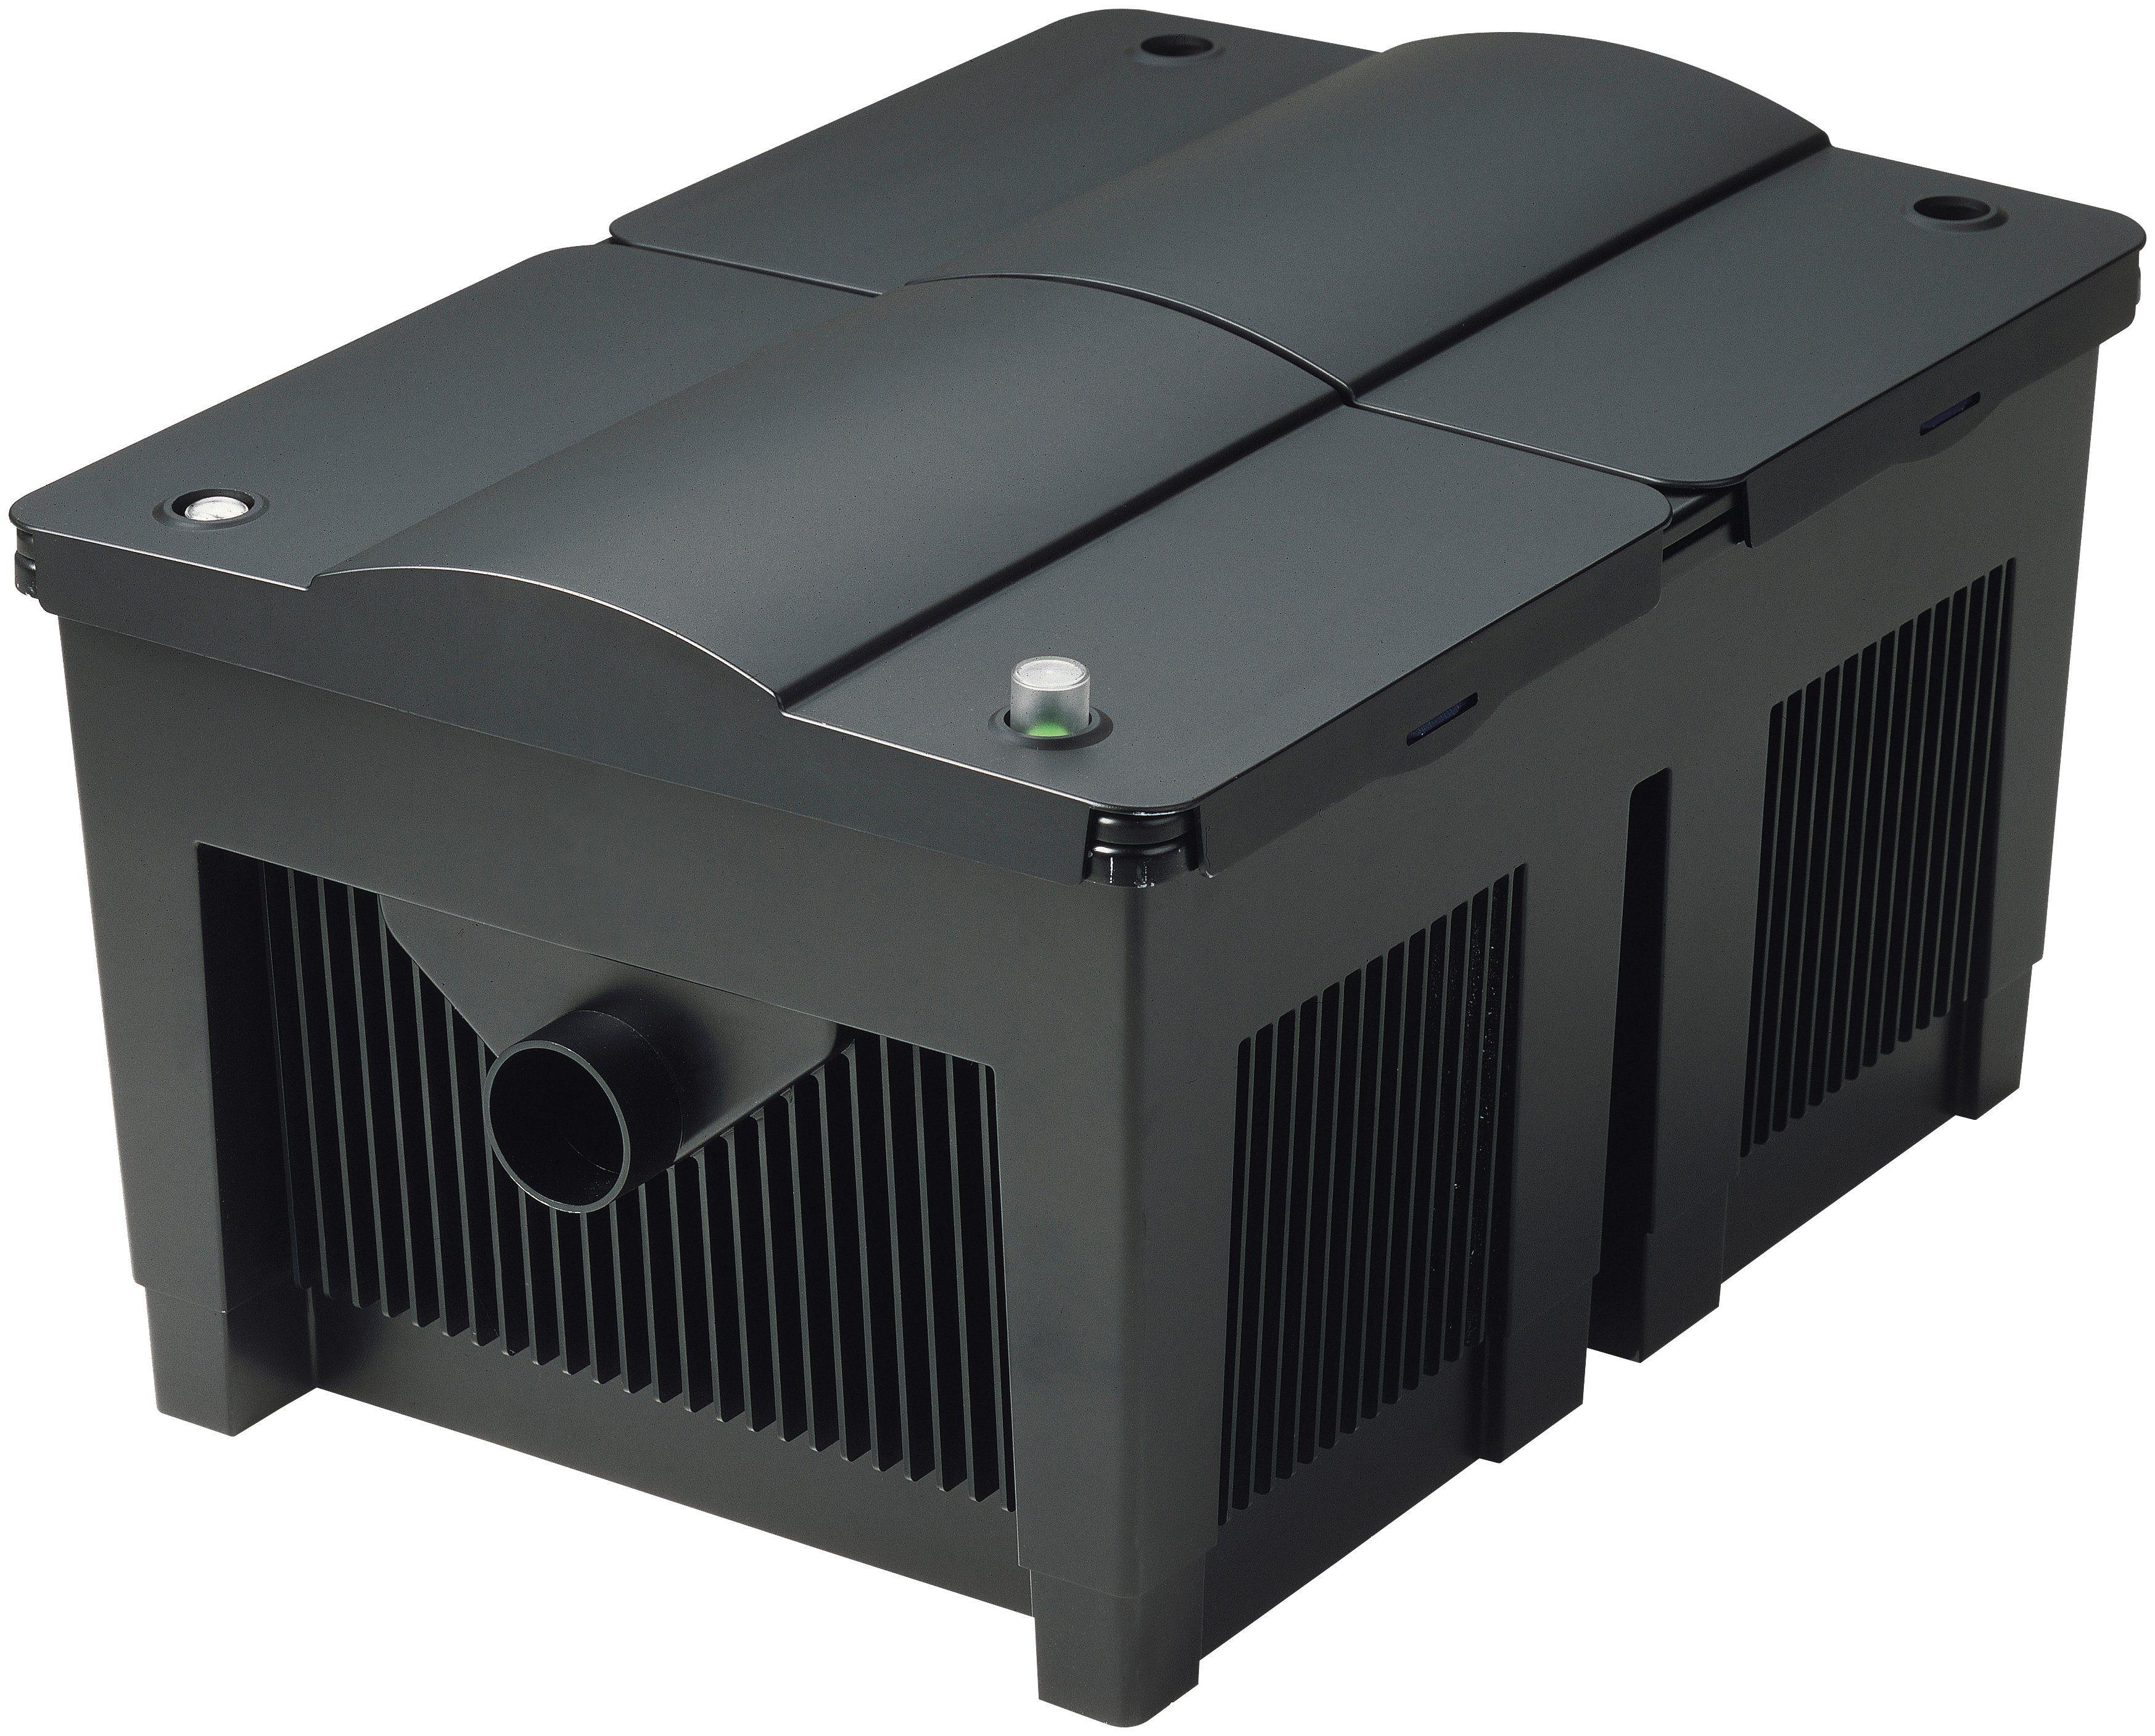 OASE Teichfilter »BioSmart 36000«, 8000 l/h